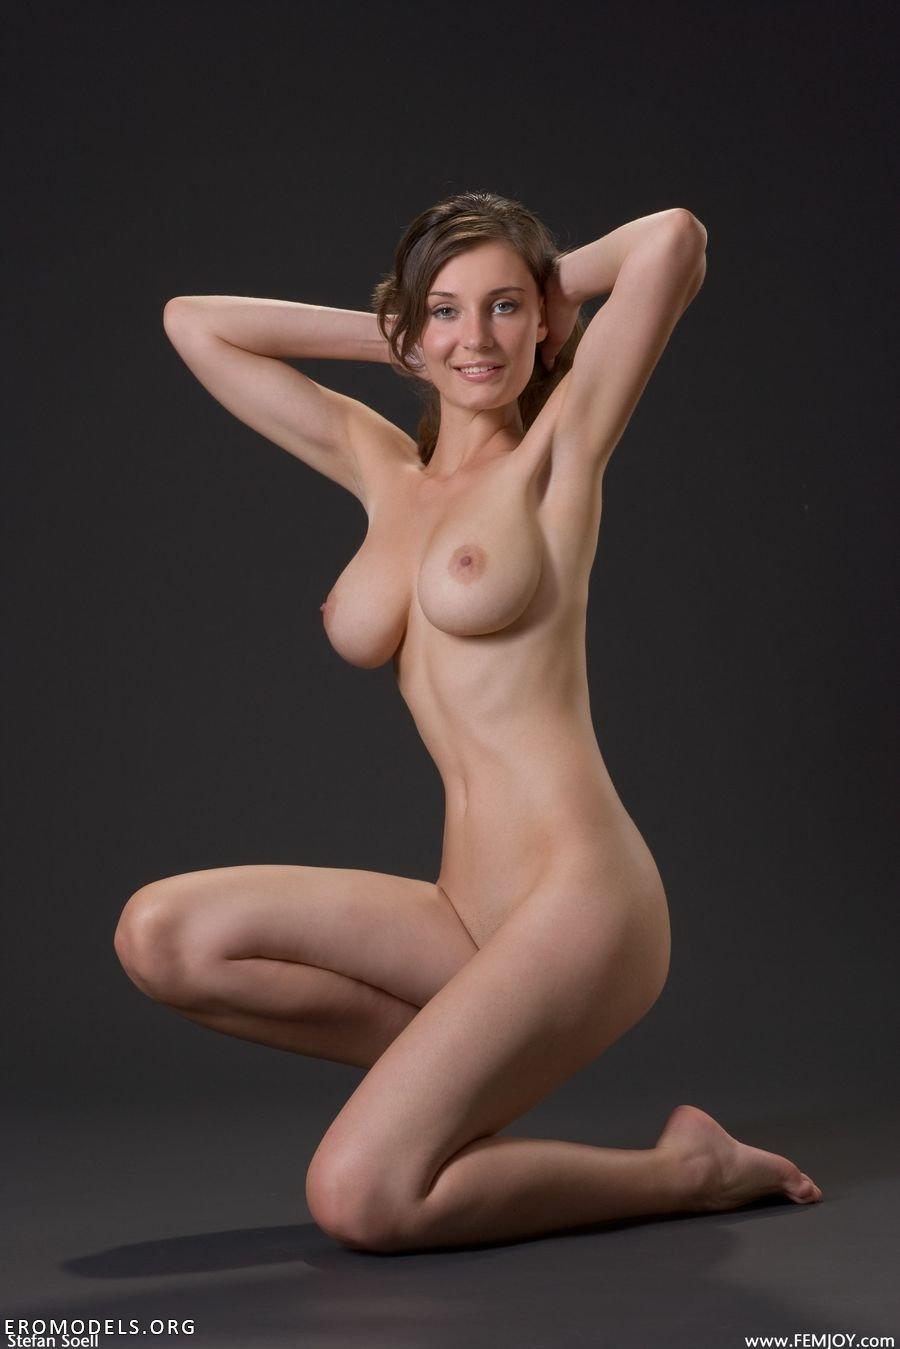 Типы женских фигур фото еро фото 4 фотография